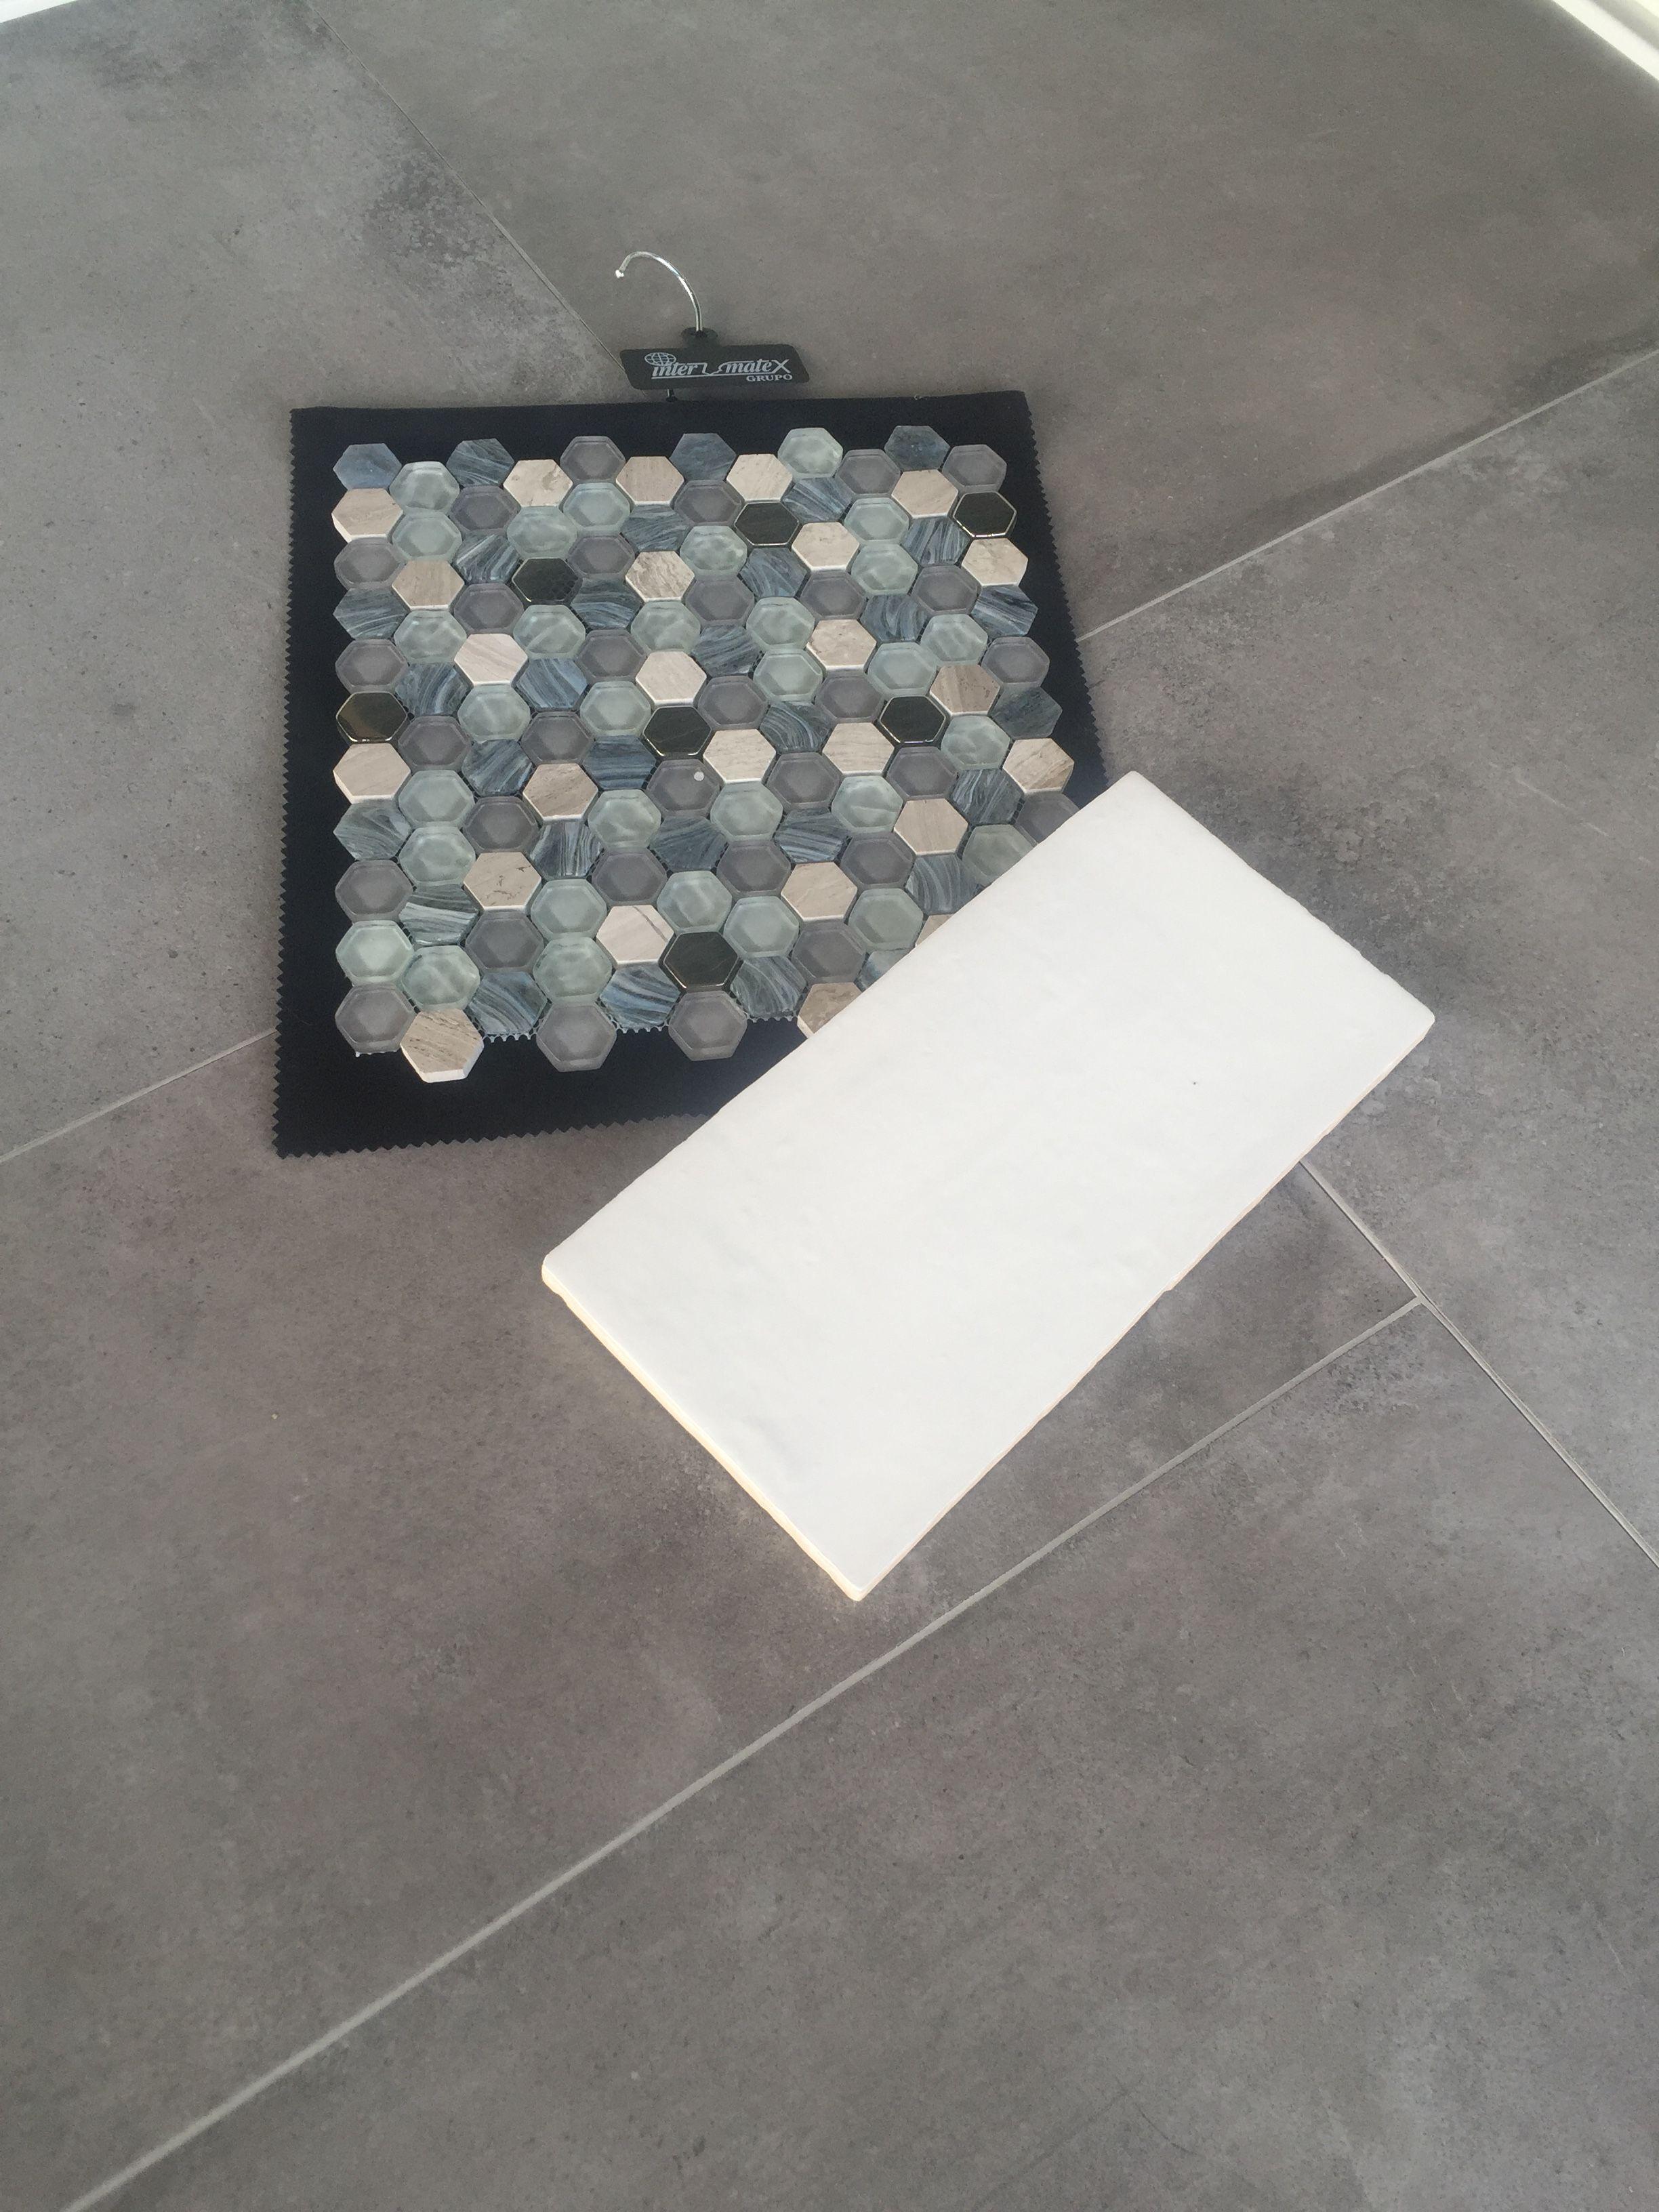 Badkamer Tegel Betonlook : Welke vloer in badkamer best of pvc vloer tegels betonlook